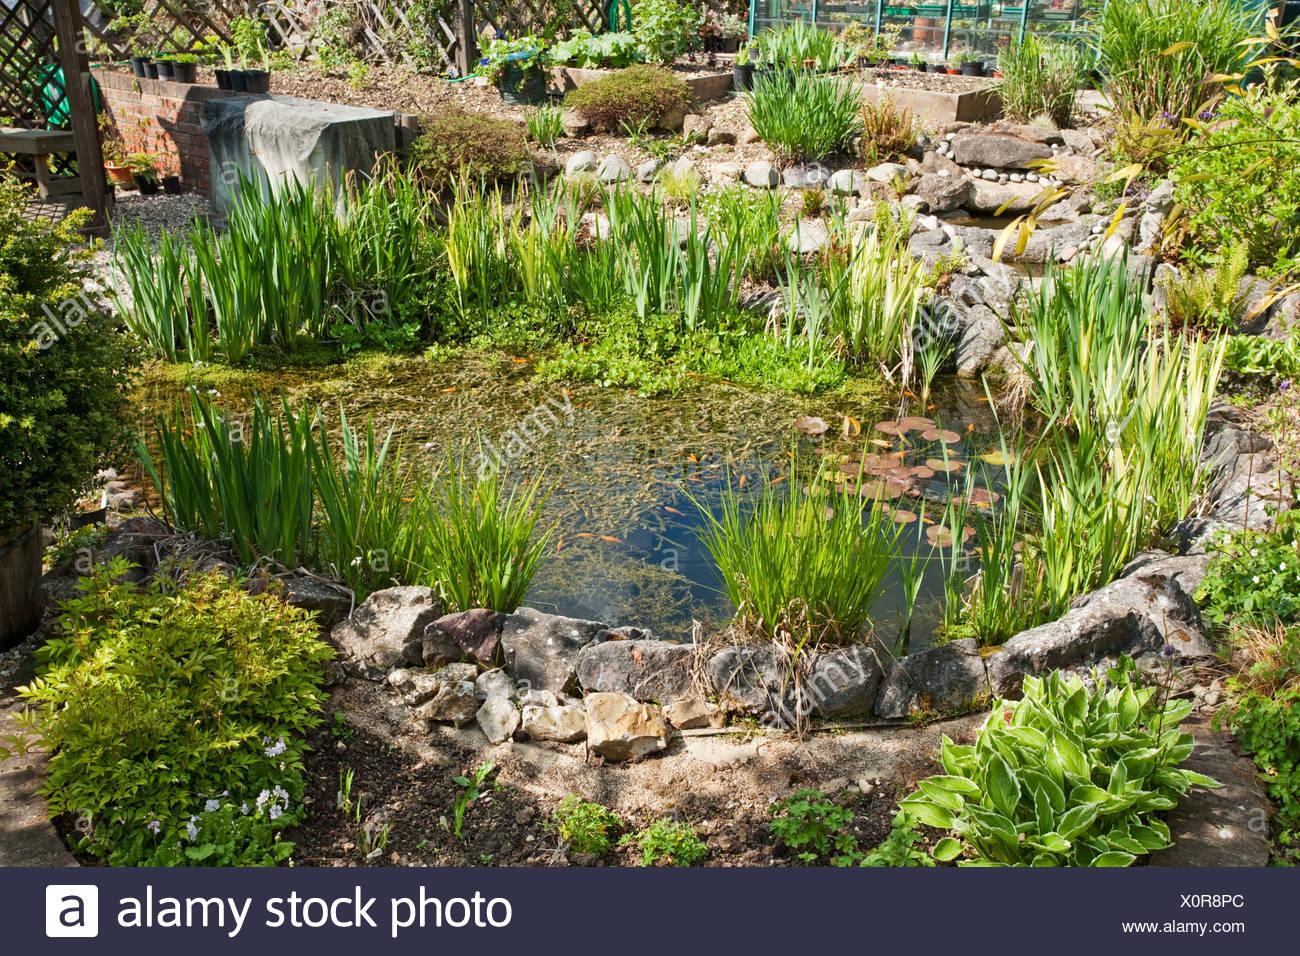 Mature landscaped garden pond in the spring sunshine, Uk - Stock Image